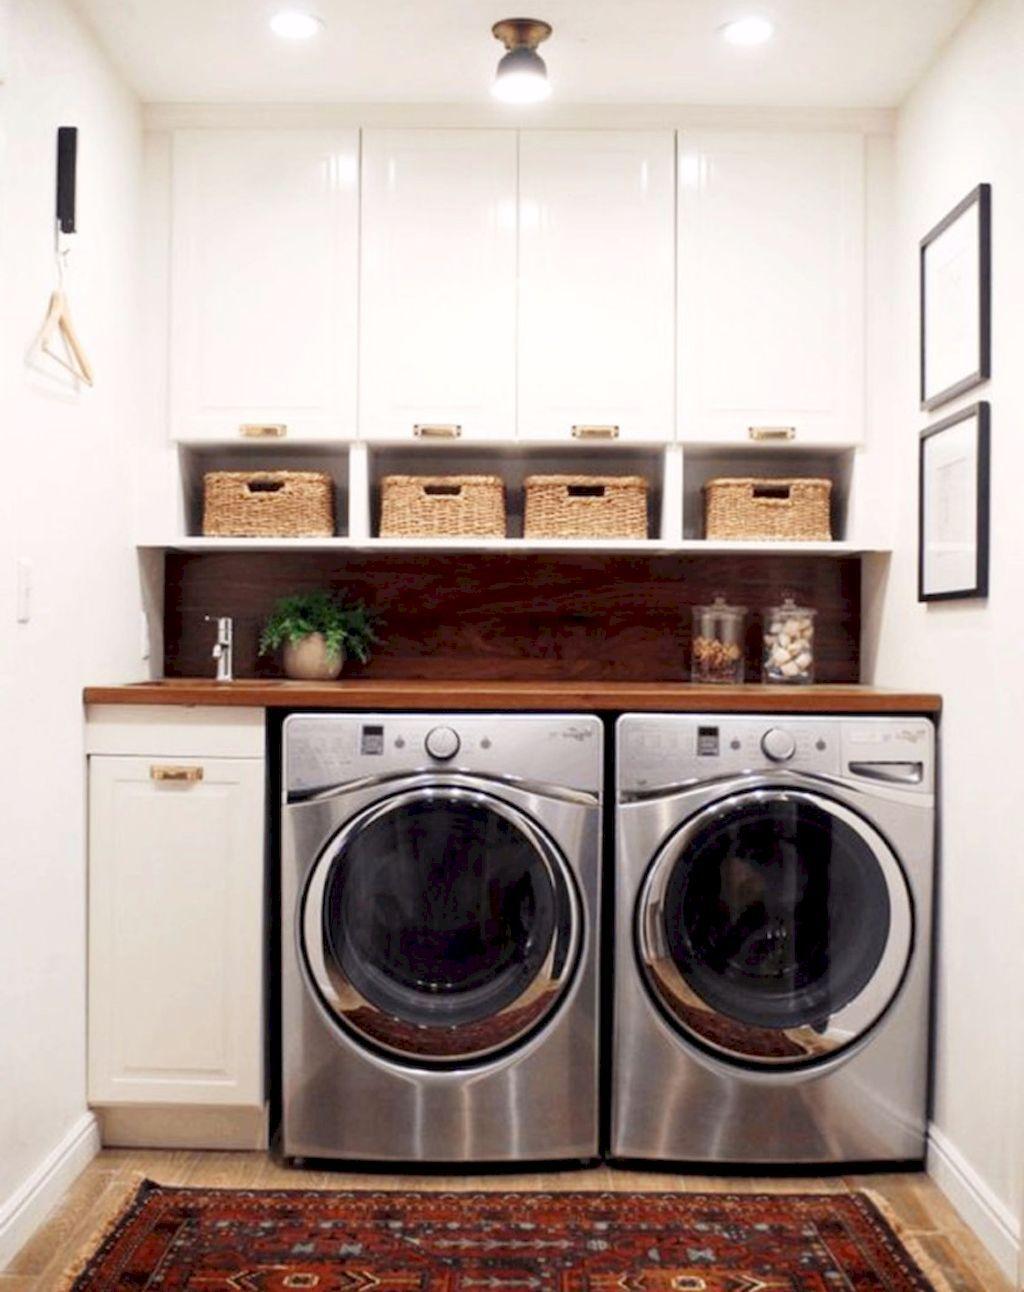 Cool 55 Smart Laundry Room Organization Ideas https